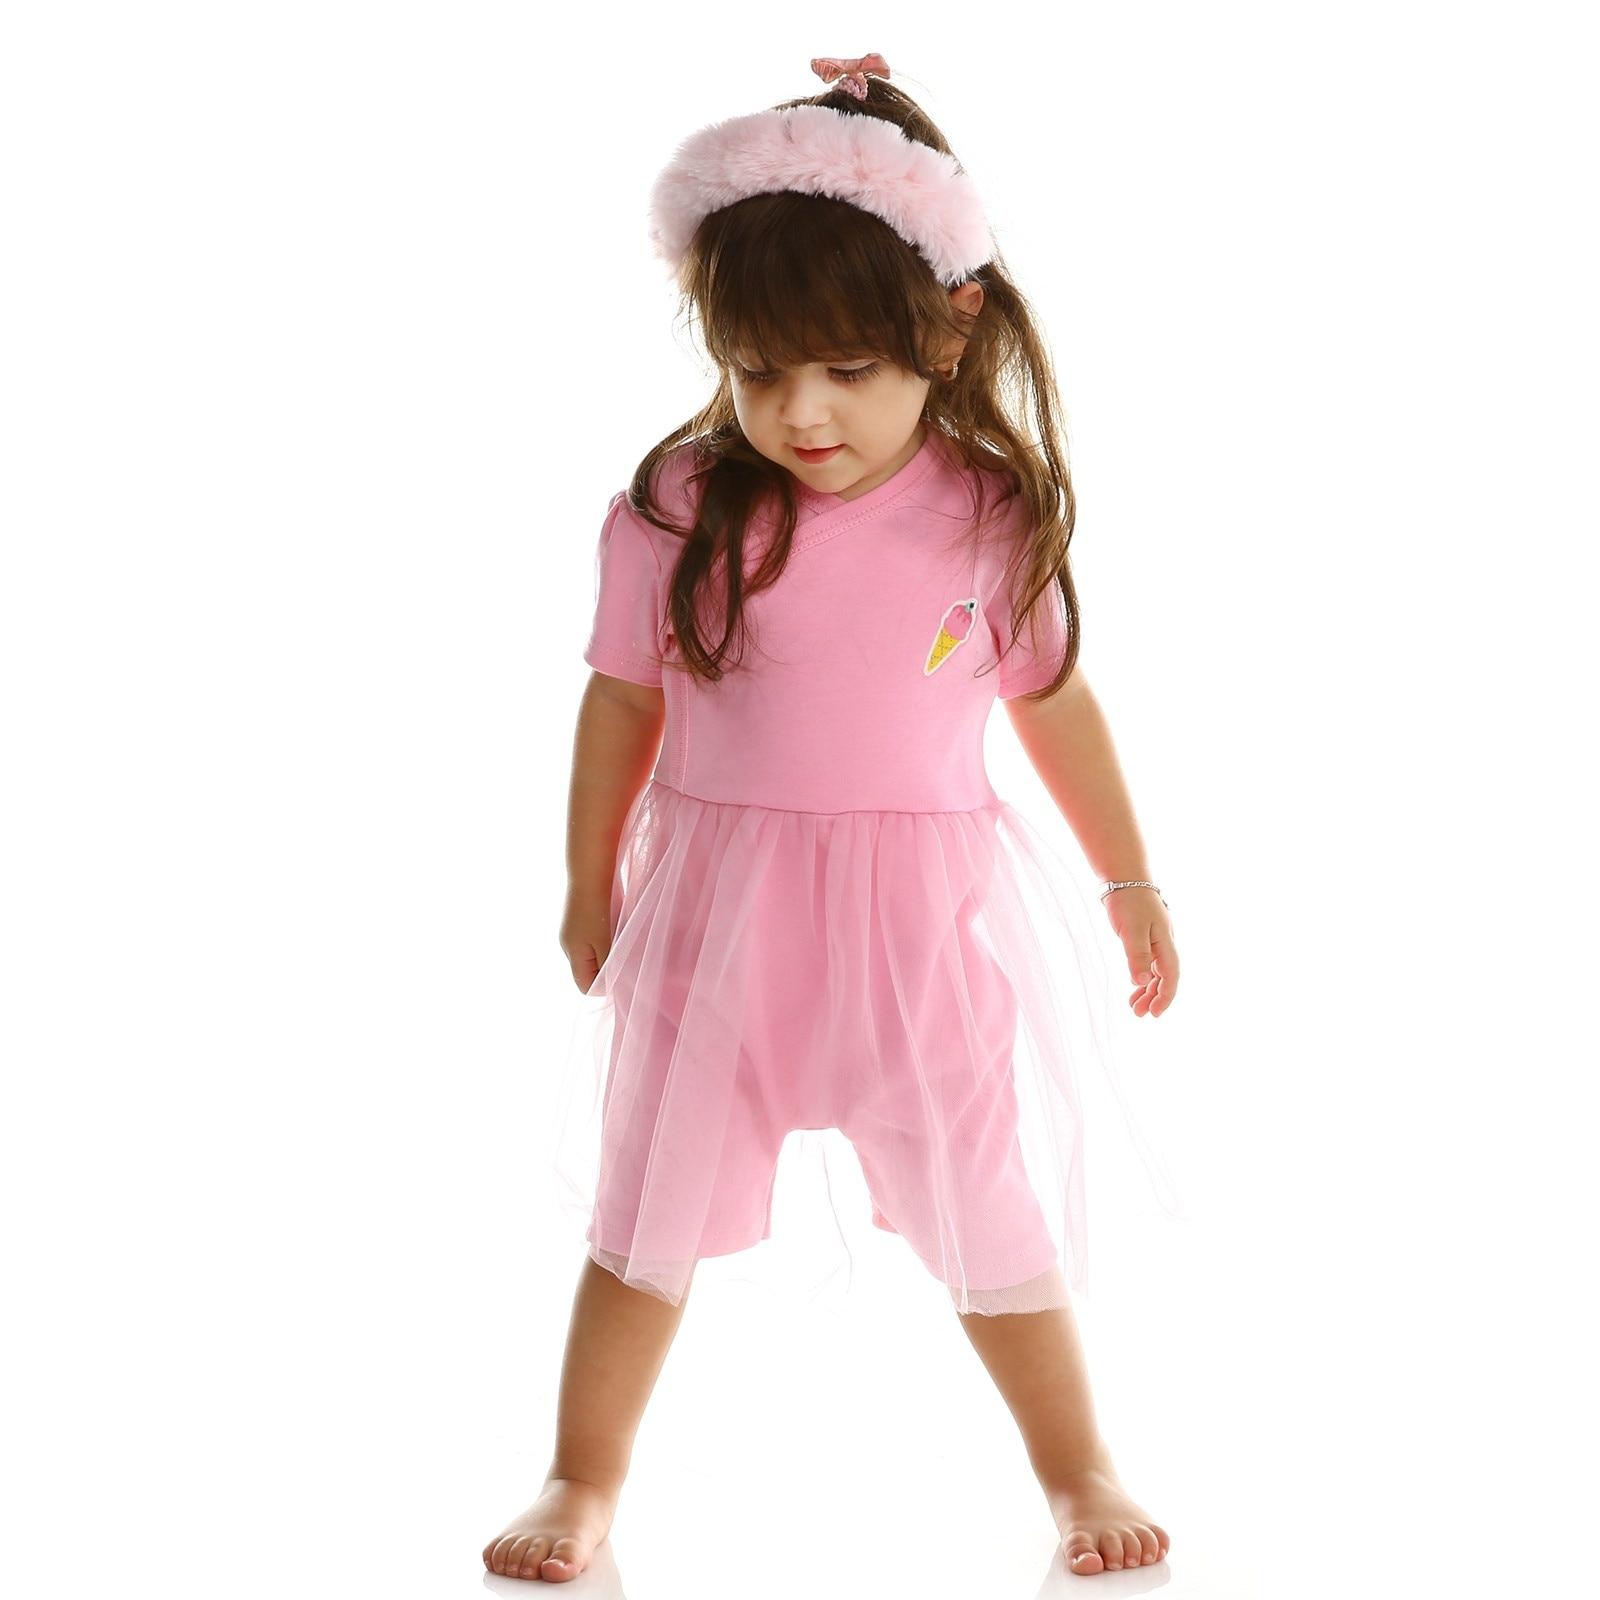 Ebebek HelloBaby Summer Baby Sweet Fruits Tulle Dress